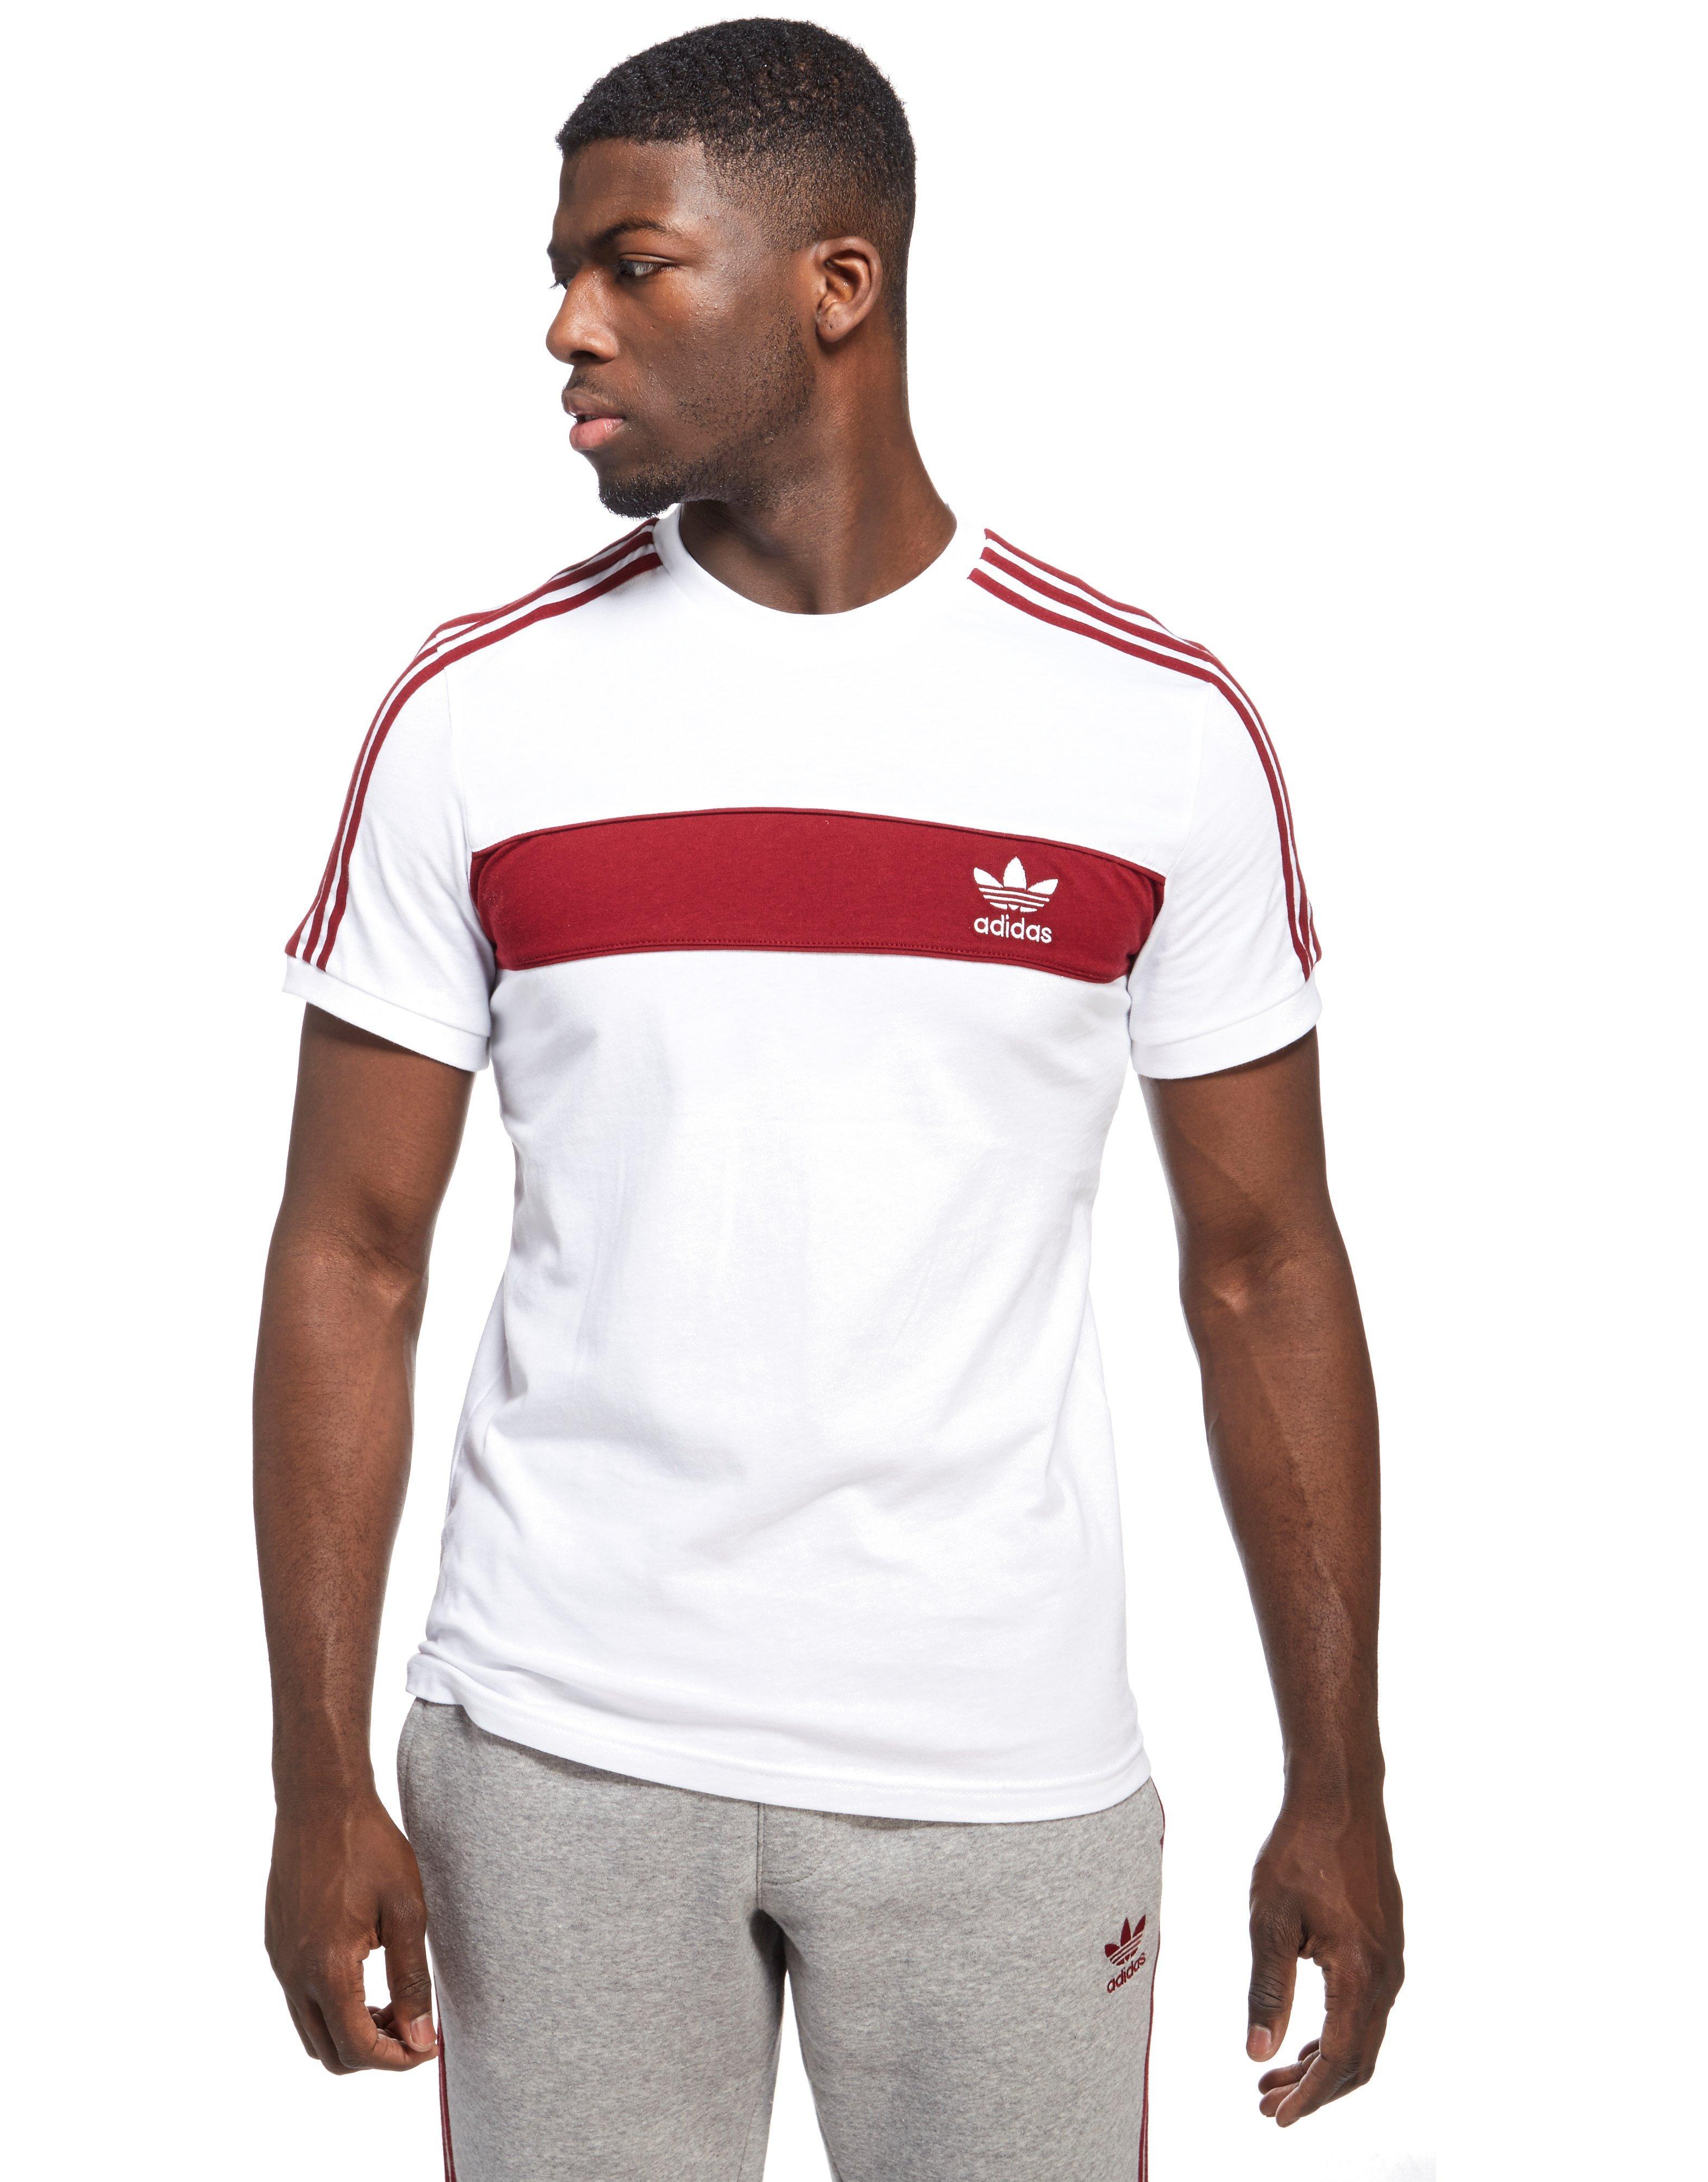 adidas originals t shirt jd sports